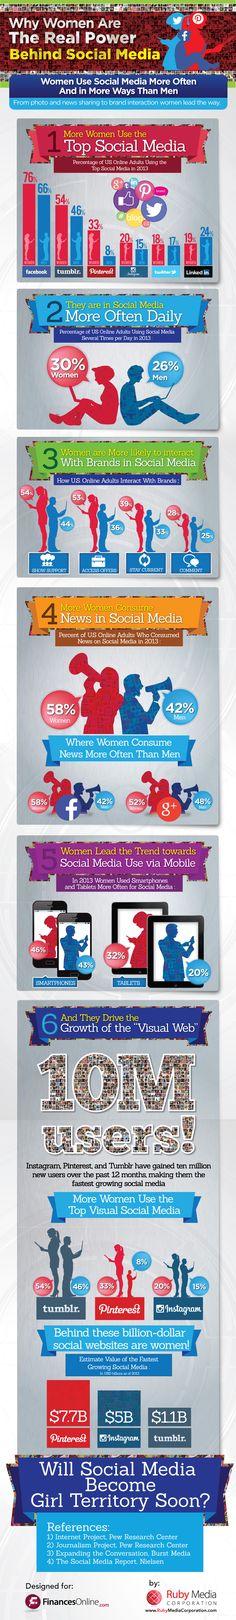 Social Media.. it's a women's matter